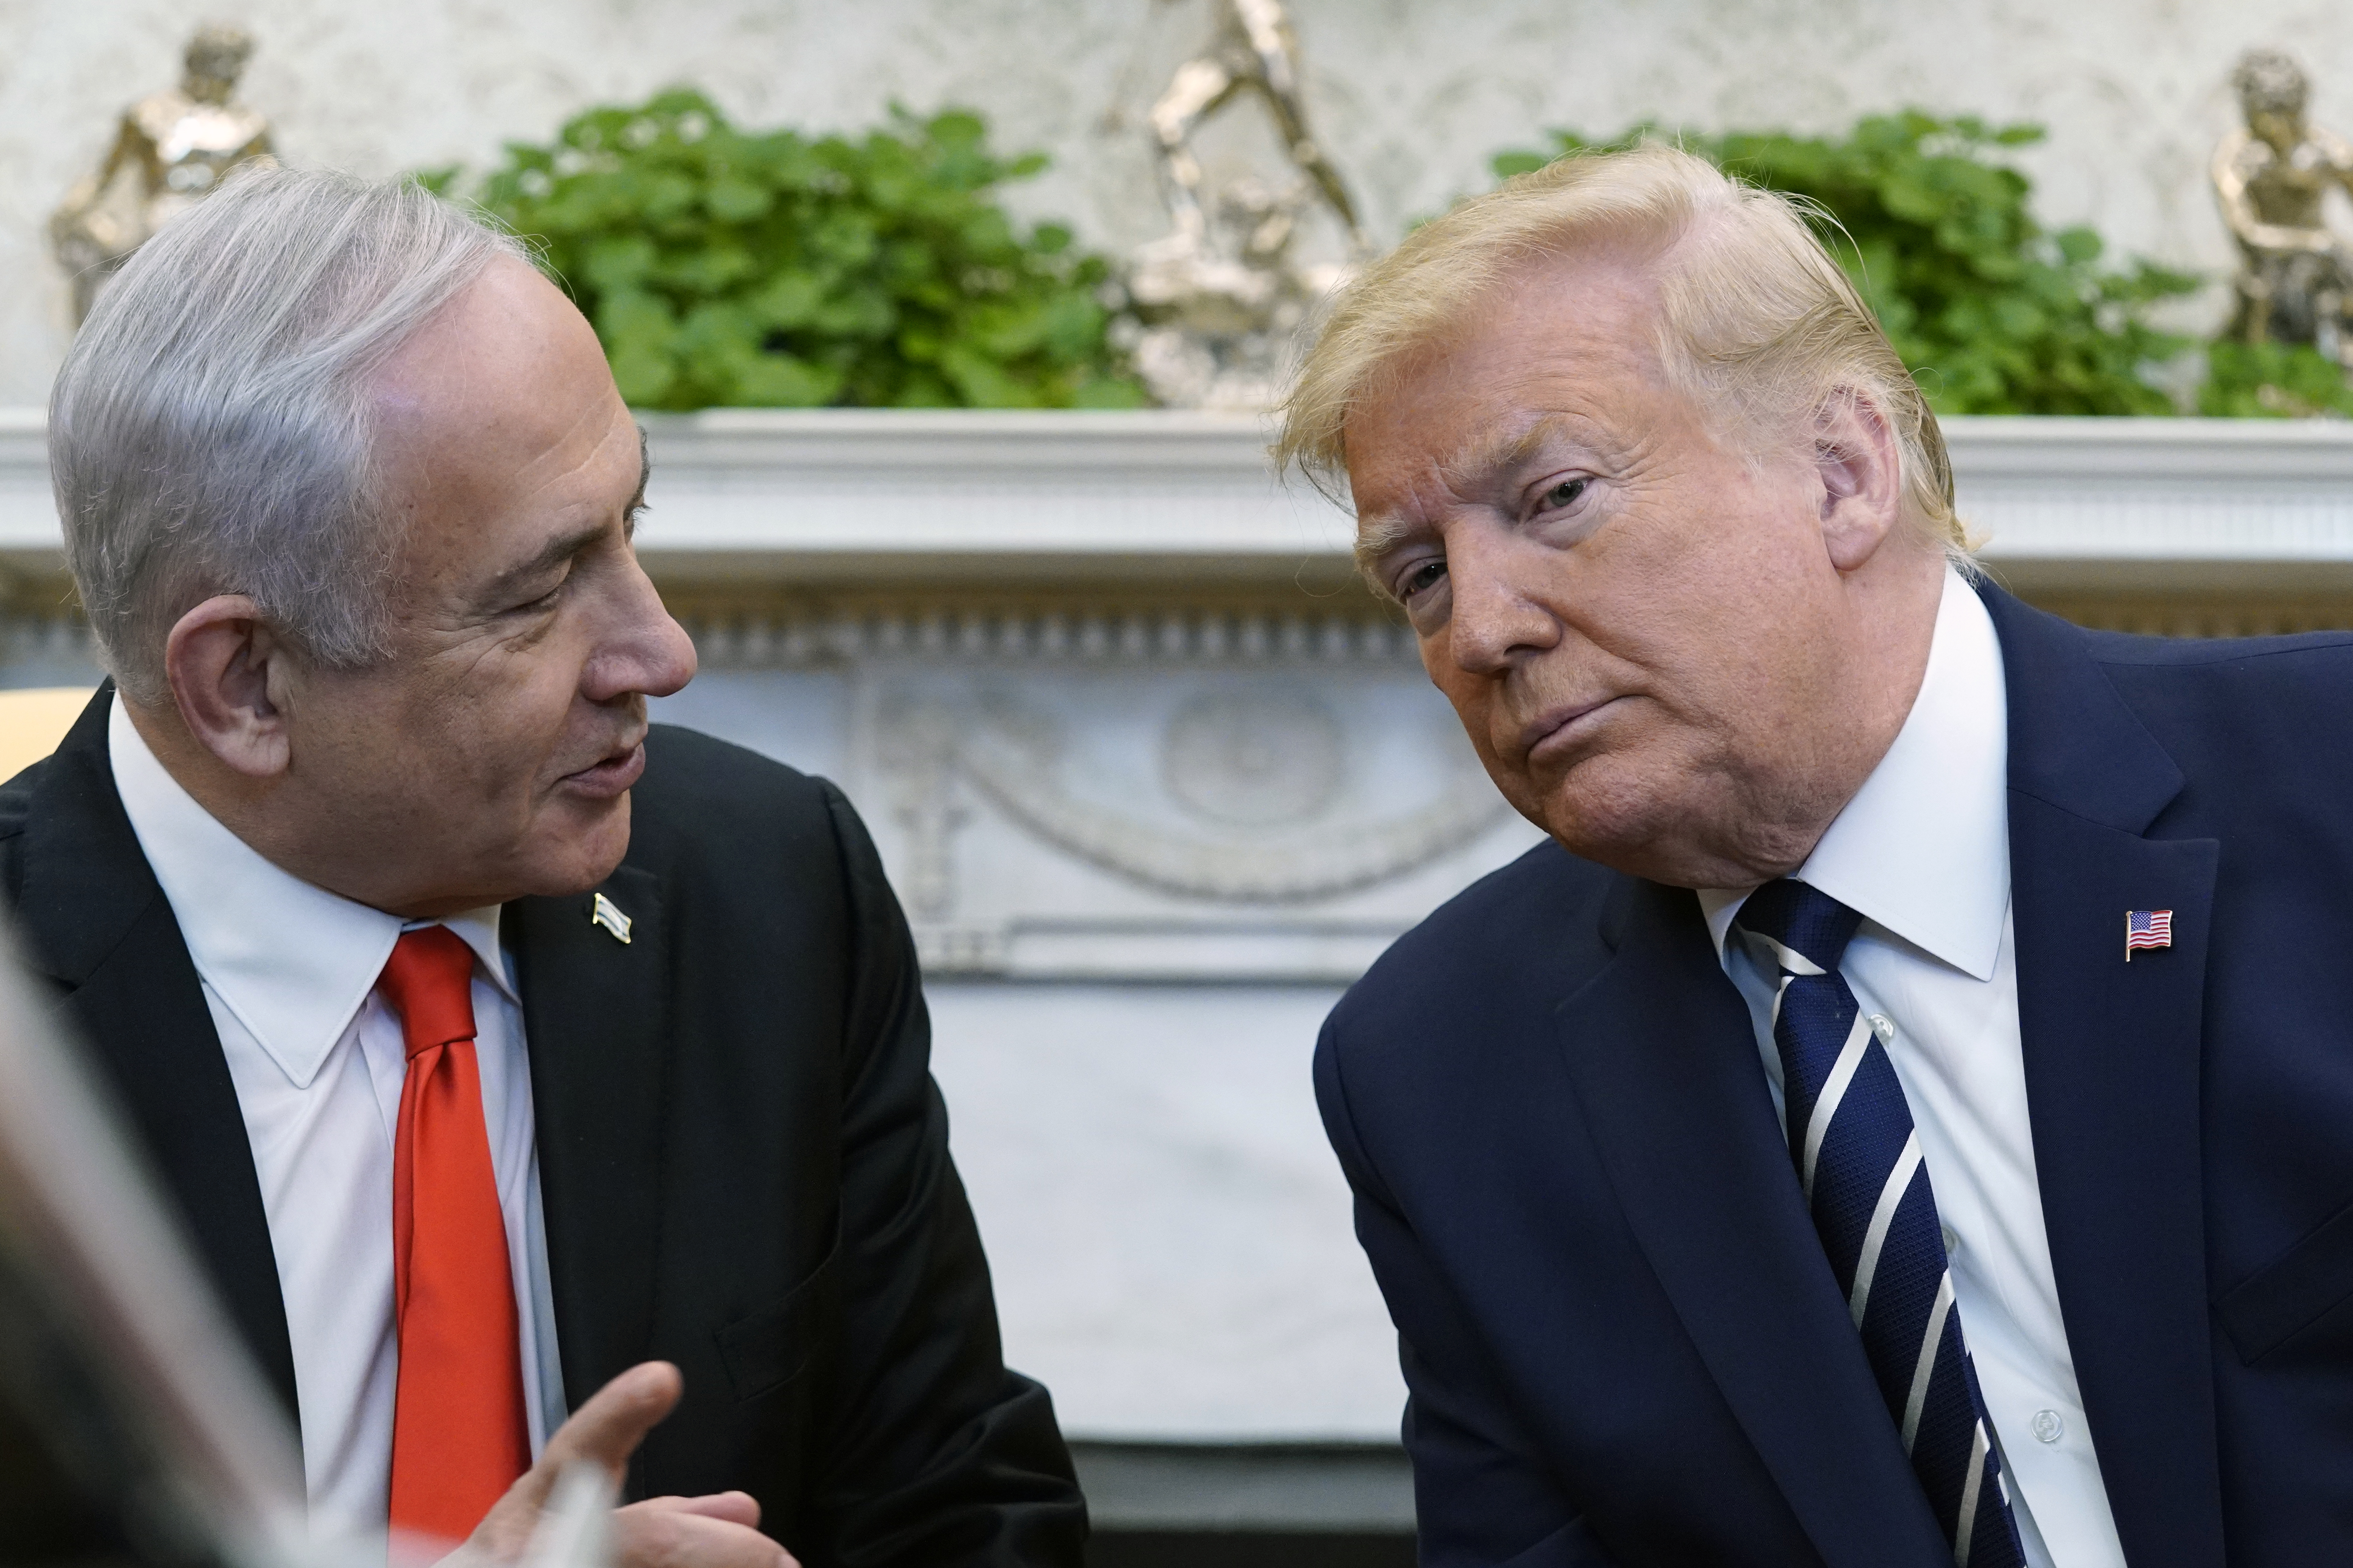 Donald Trump greets Benjamin Netanyahu to talk Israel-Palestine peace